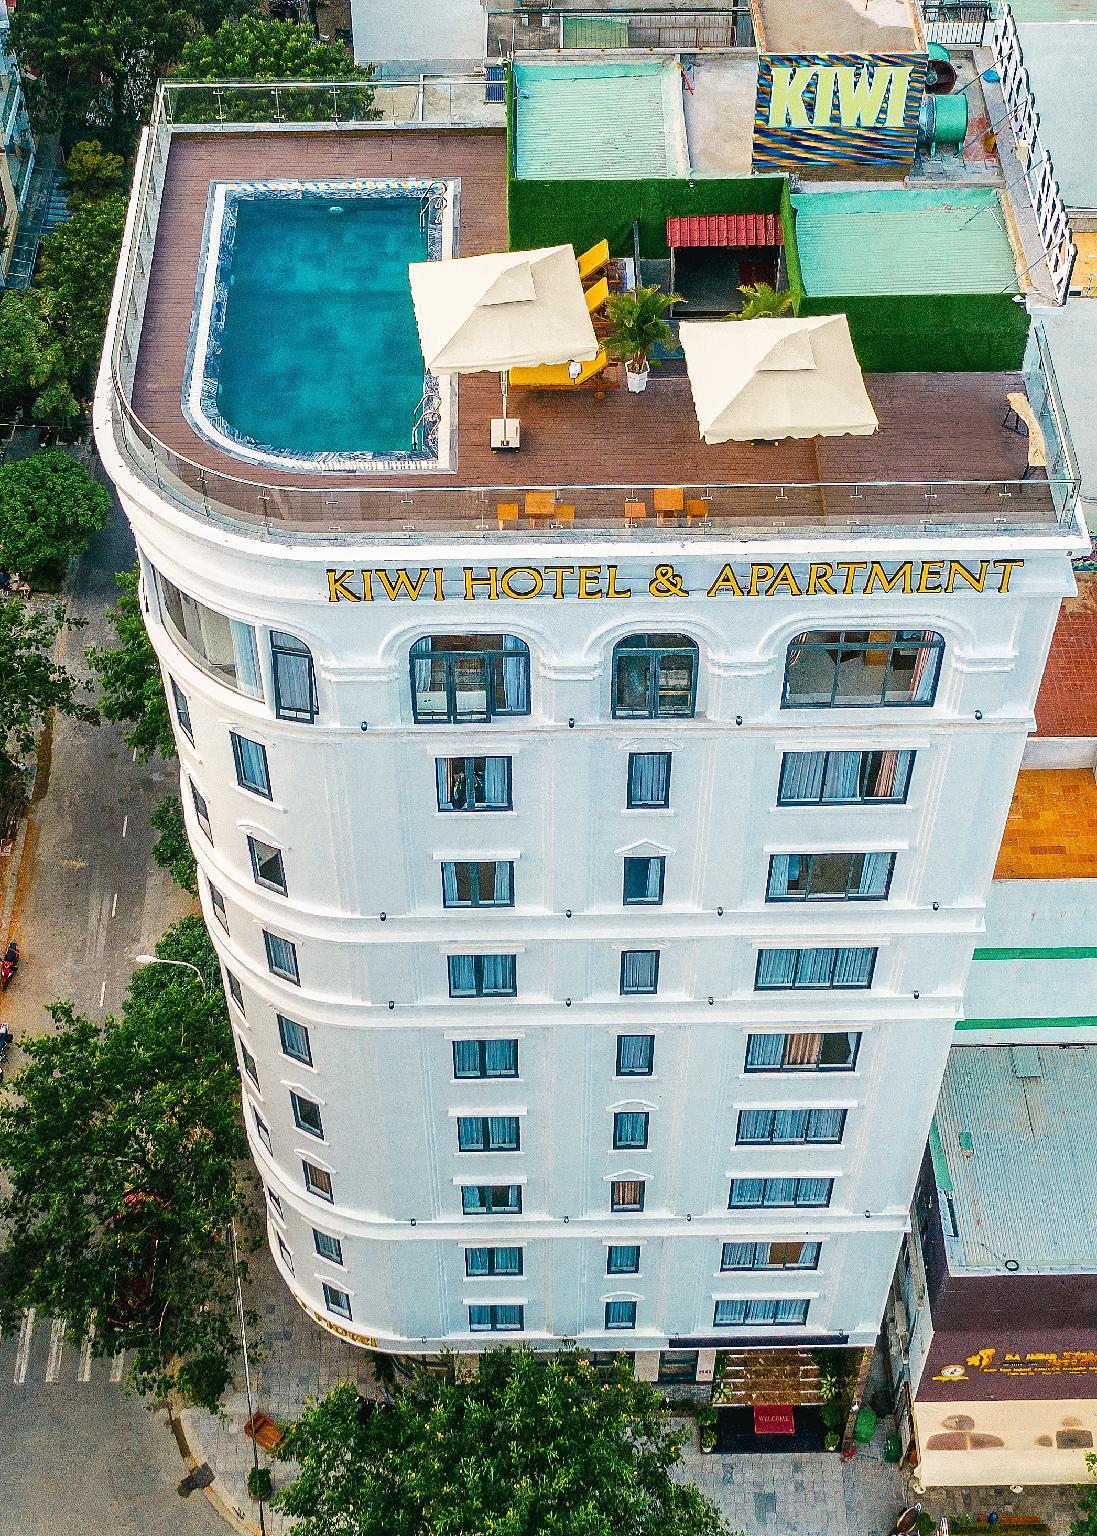 Kiwi Hotel And Apartments